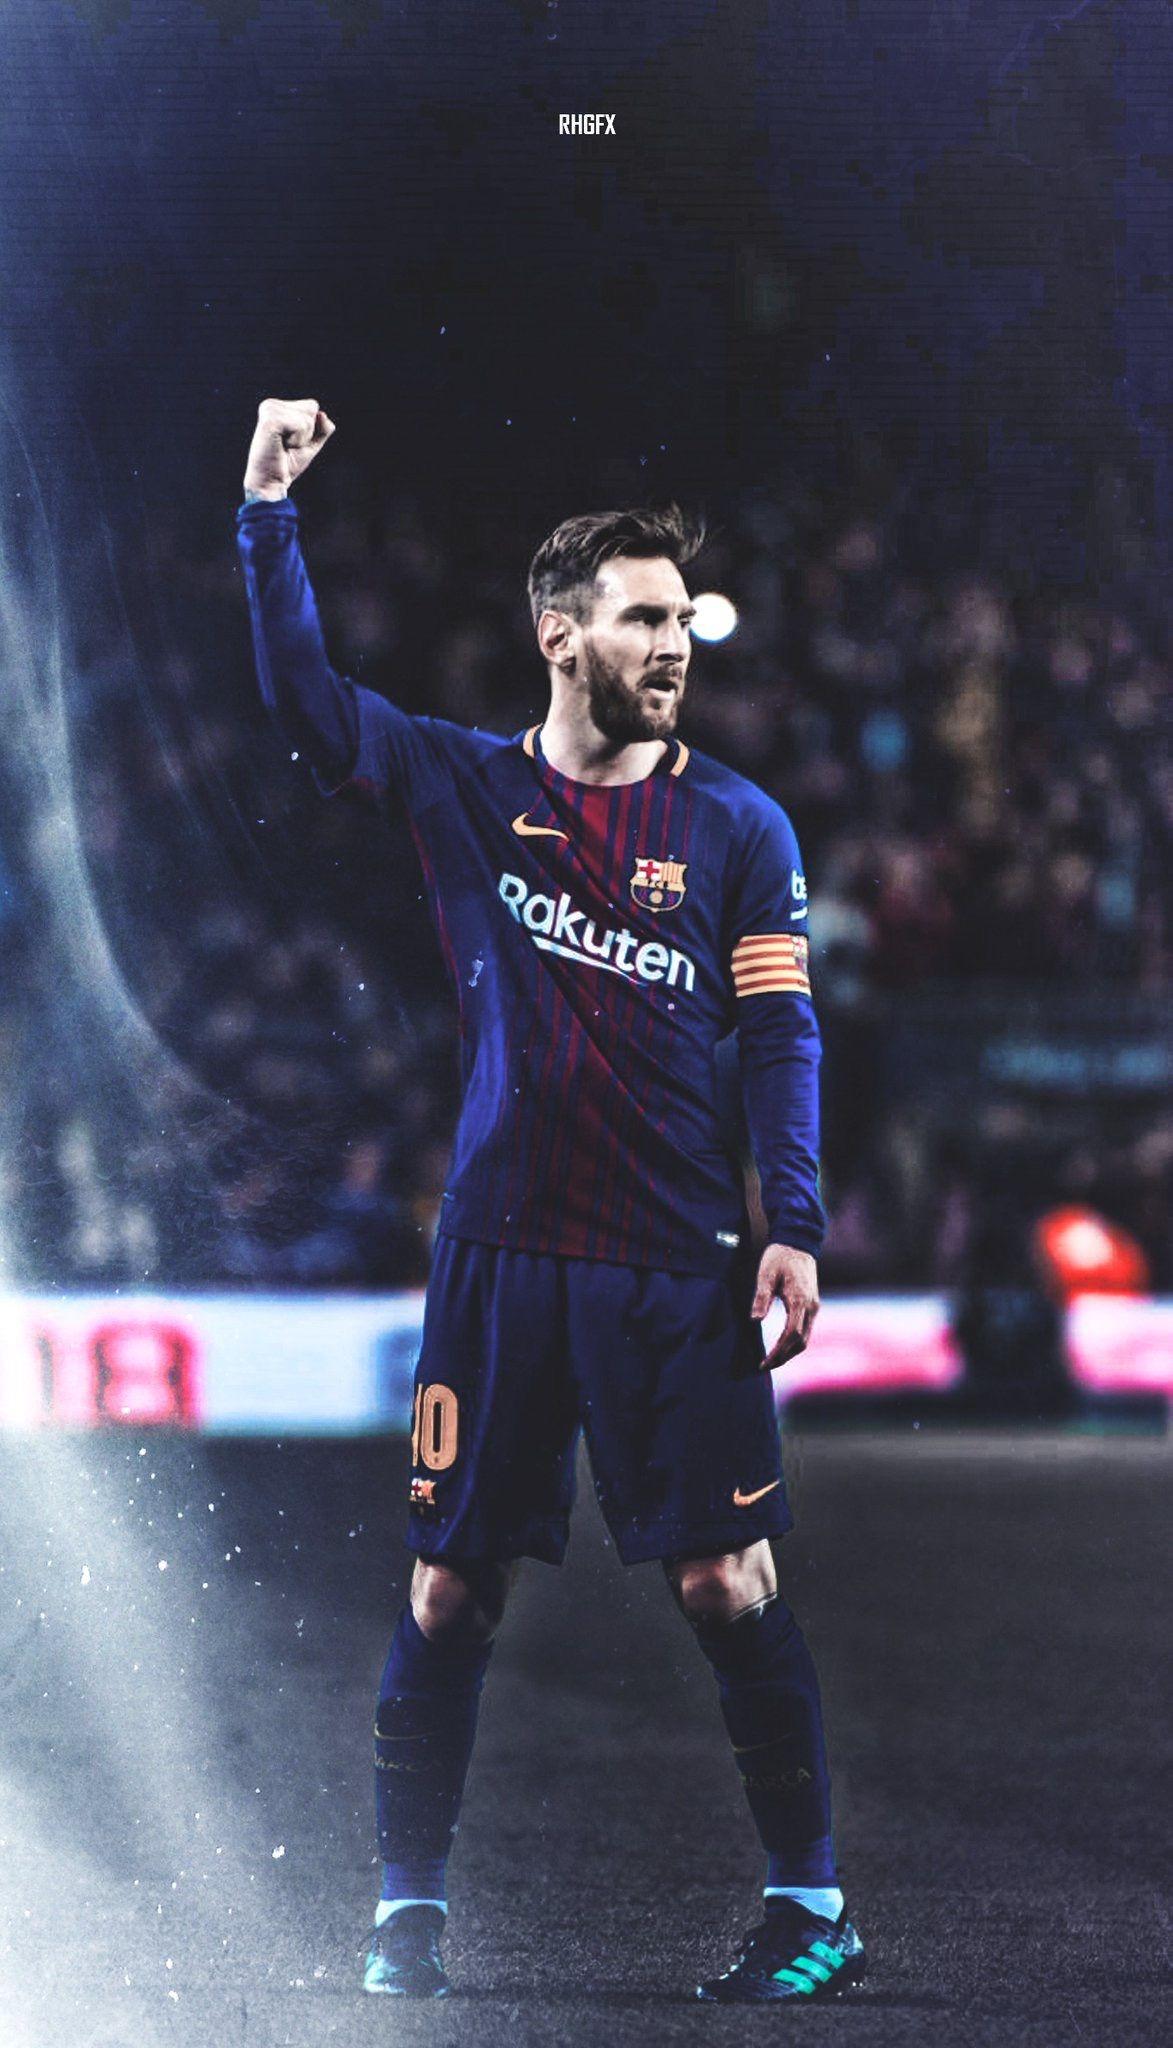 Lionel Messi Lionel Messi Barcelona Lionel Messi Messi